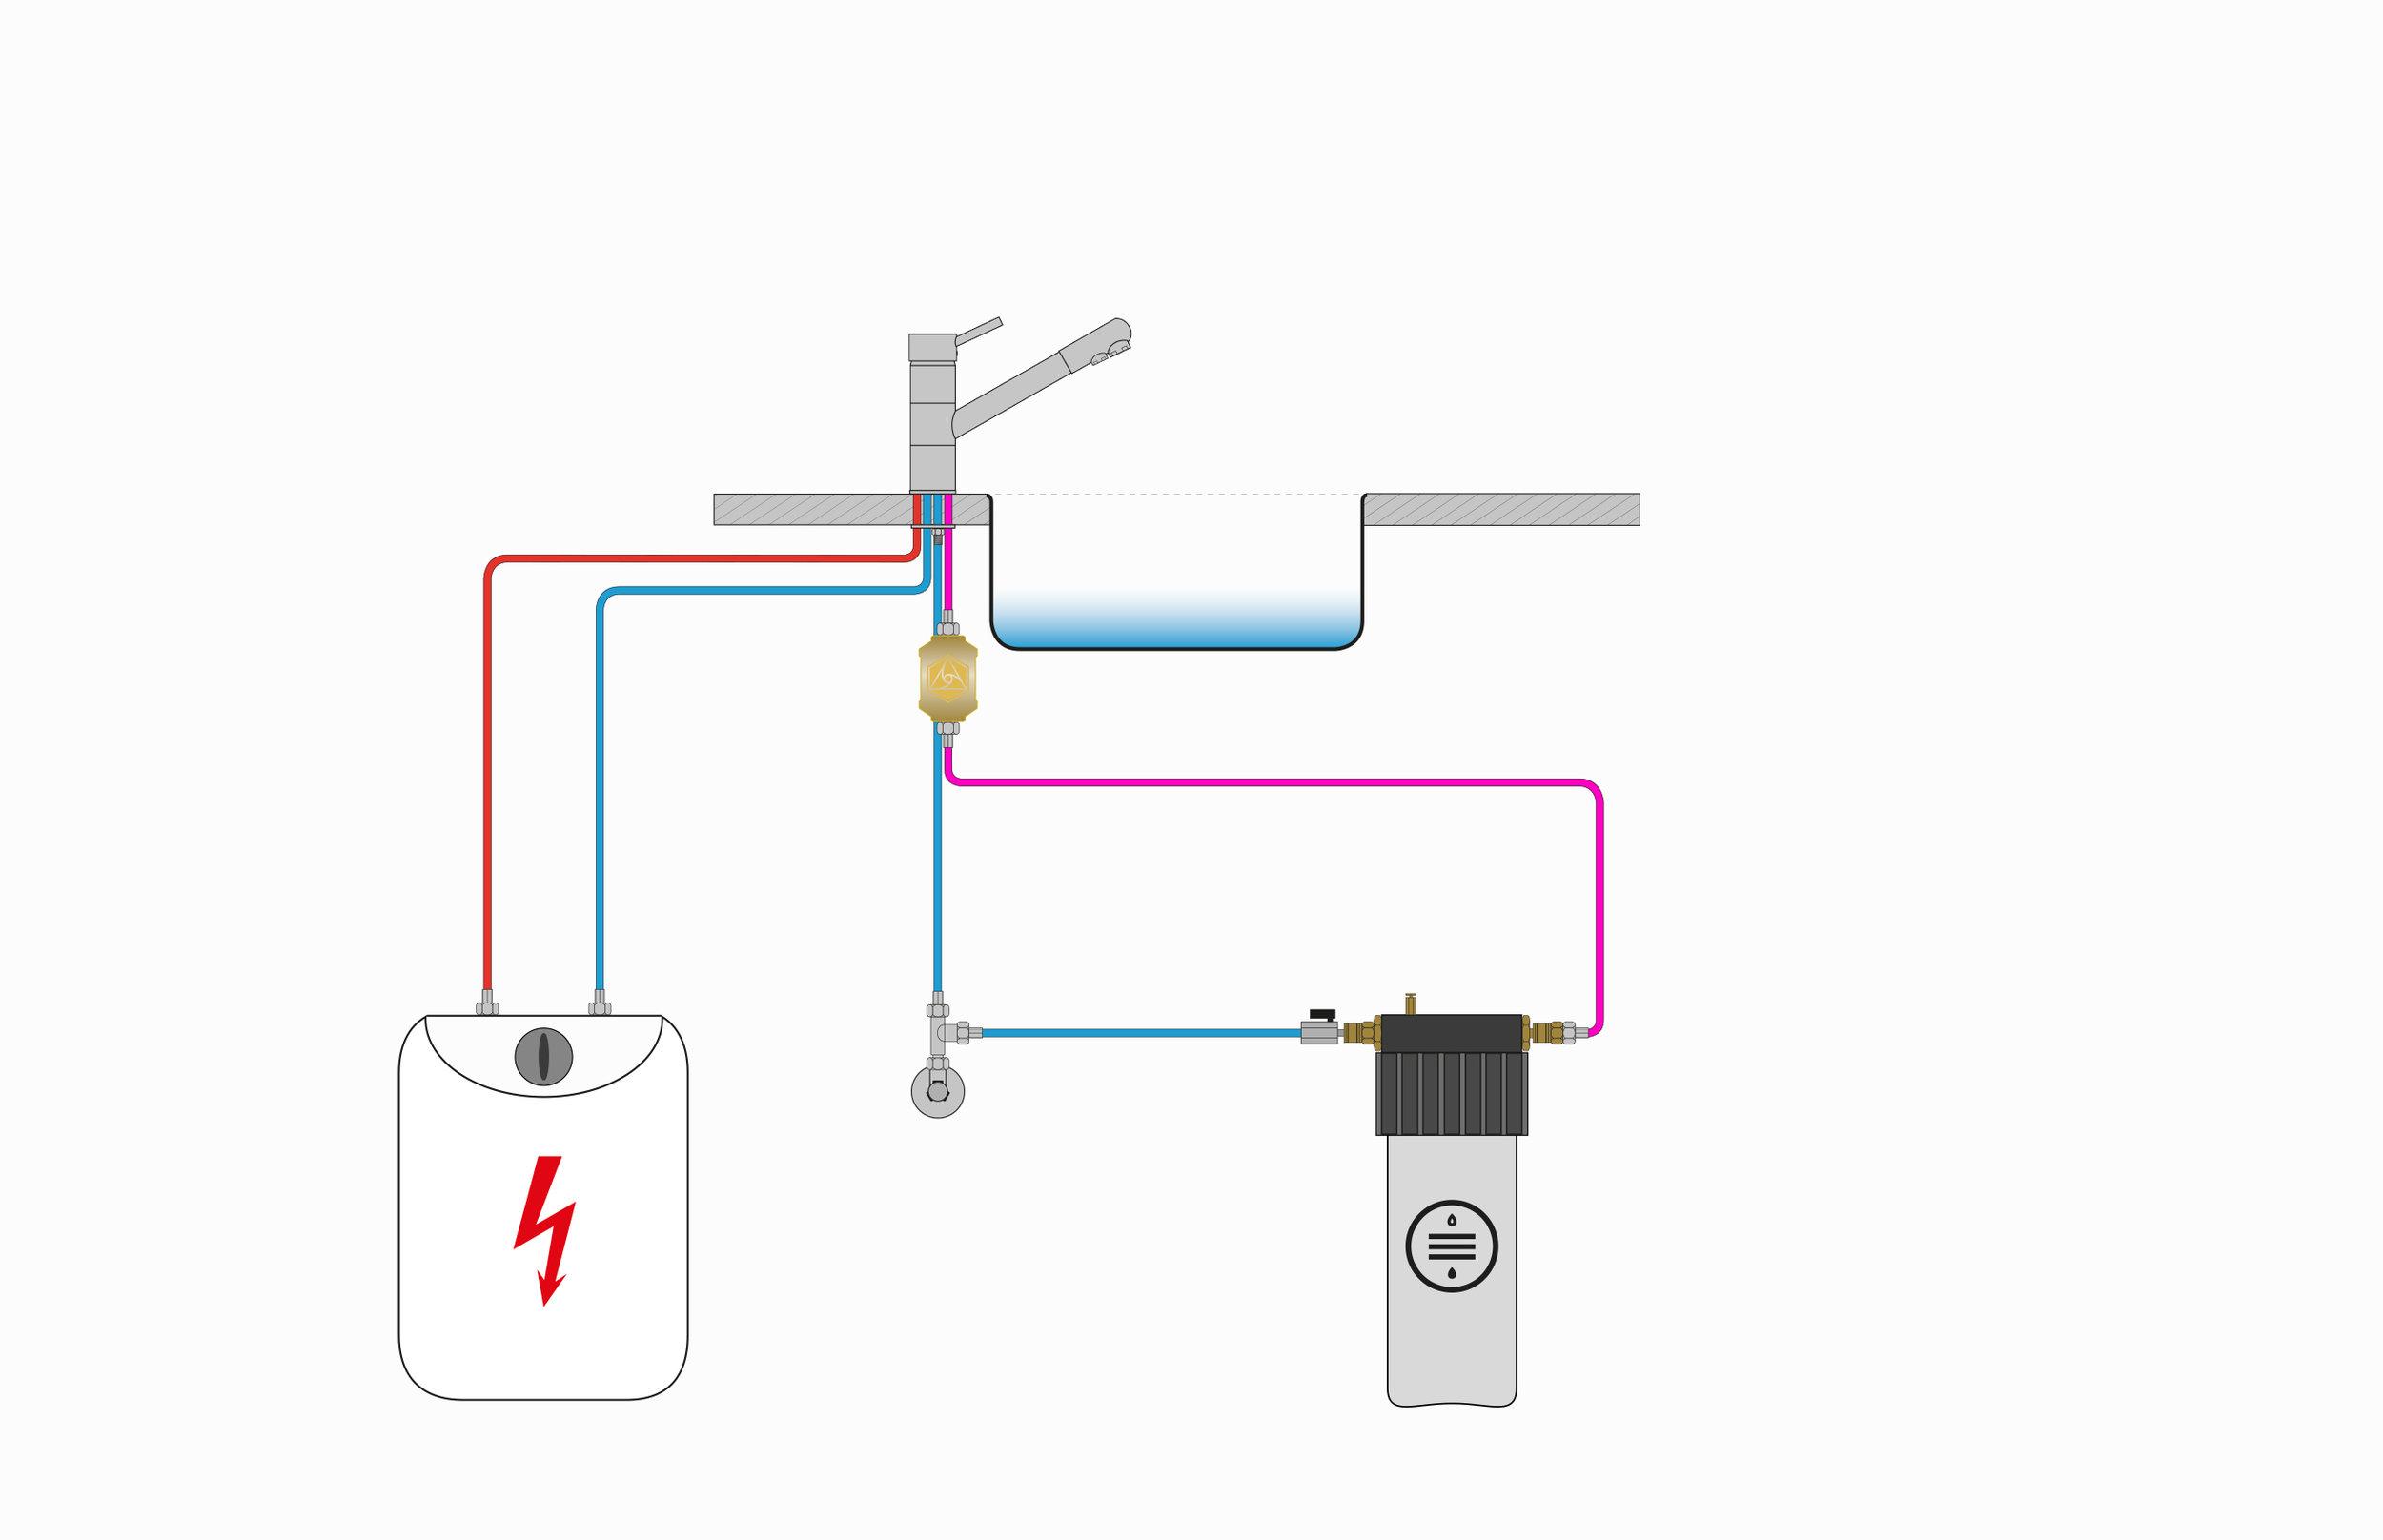 LEOGANT-BORVO-UMH-Pure-ND-Installation 4-Wege-Armatur.jpg